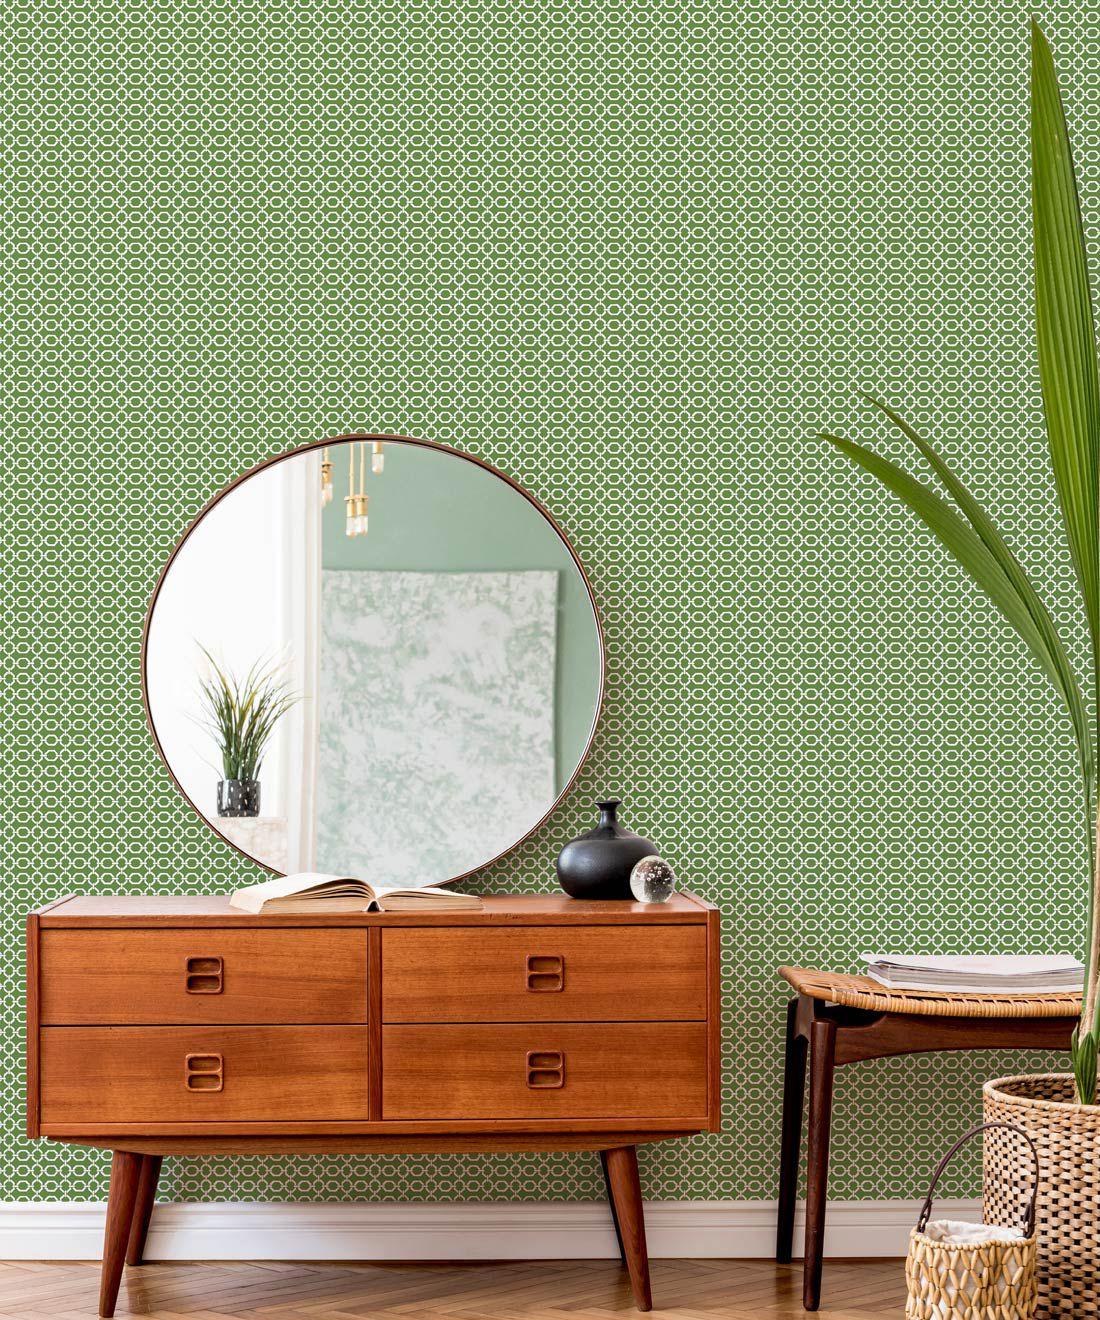 Ravello Wallpaper • Dianne Bergeron • Parsley •Insitu